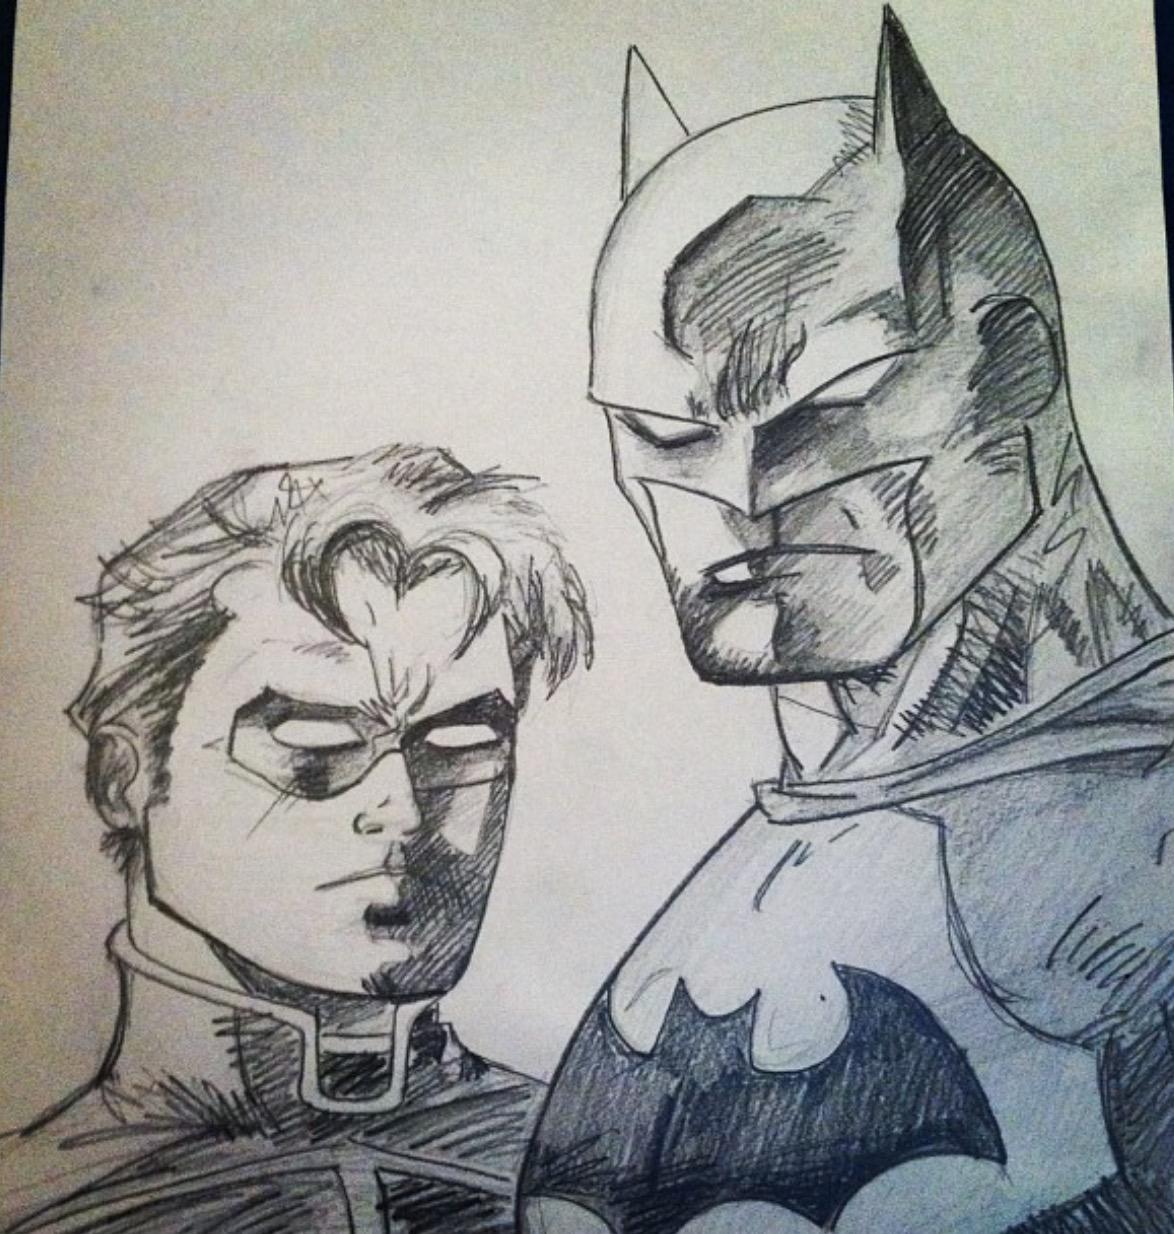 BatmanAndRobin.jpg